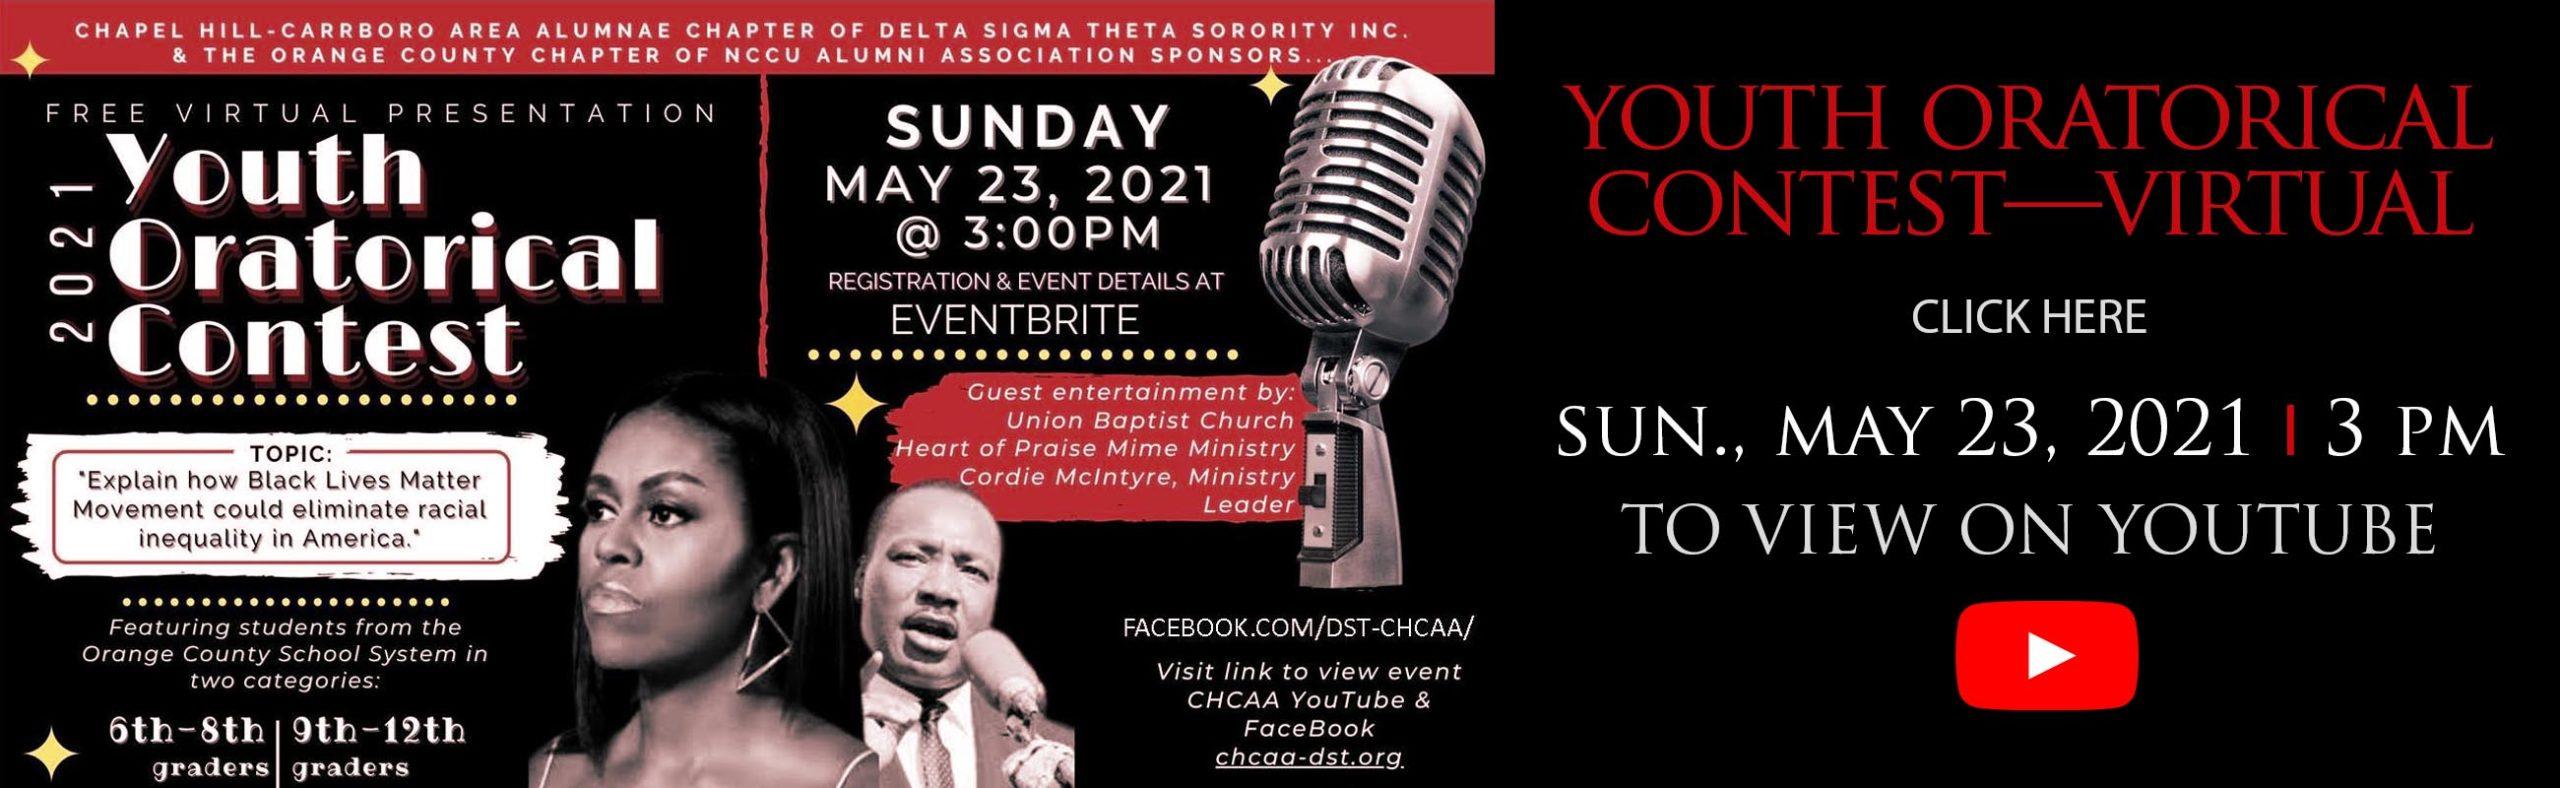 CHCAA-Youth-Oratorical-2021